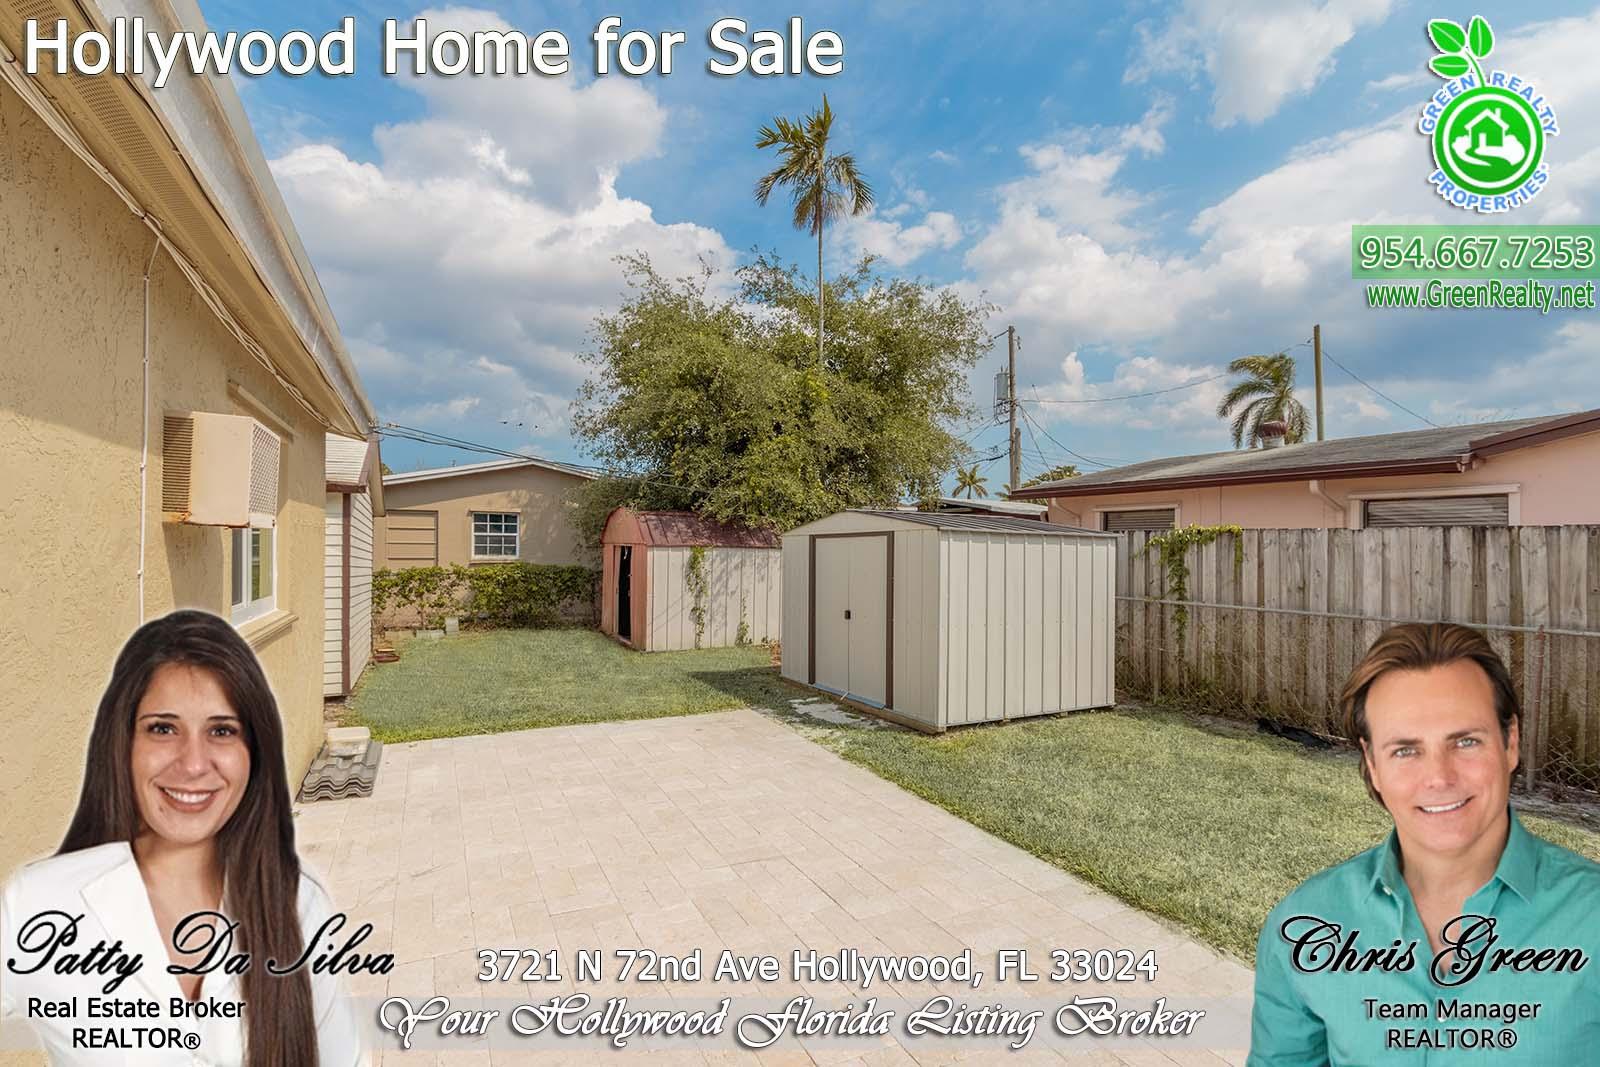 24 Hollywood Florida Real Estate Listing Patty Da Silva Green Realty properties (4)